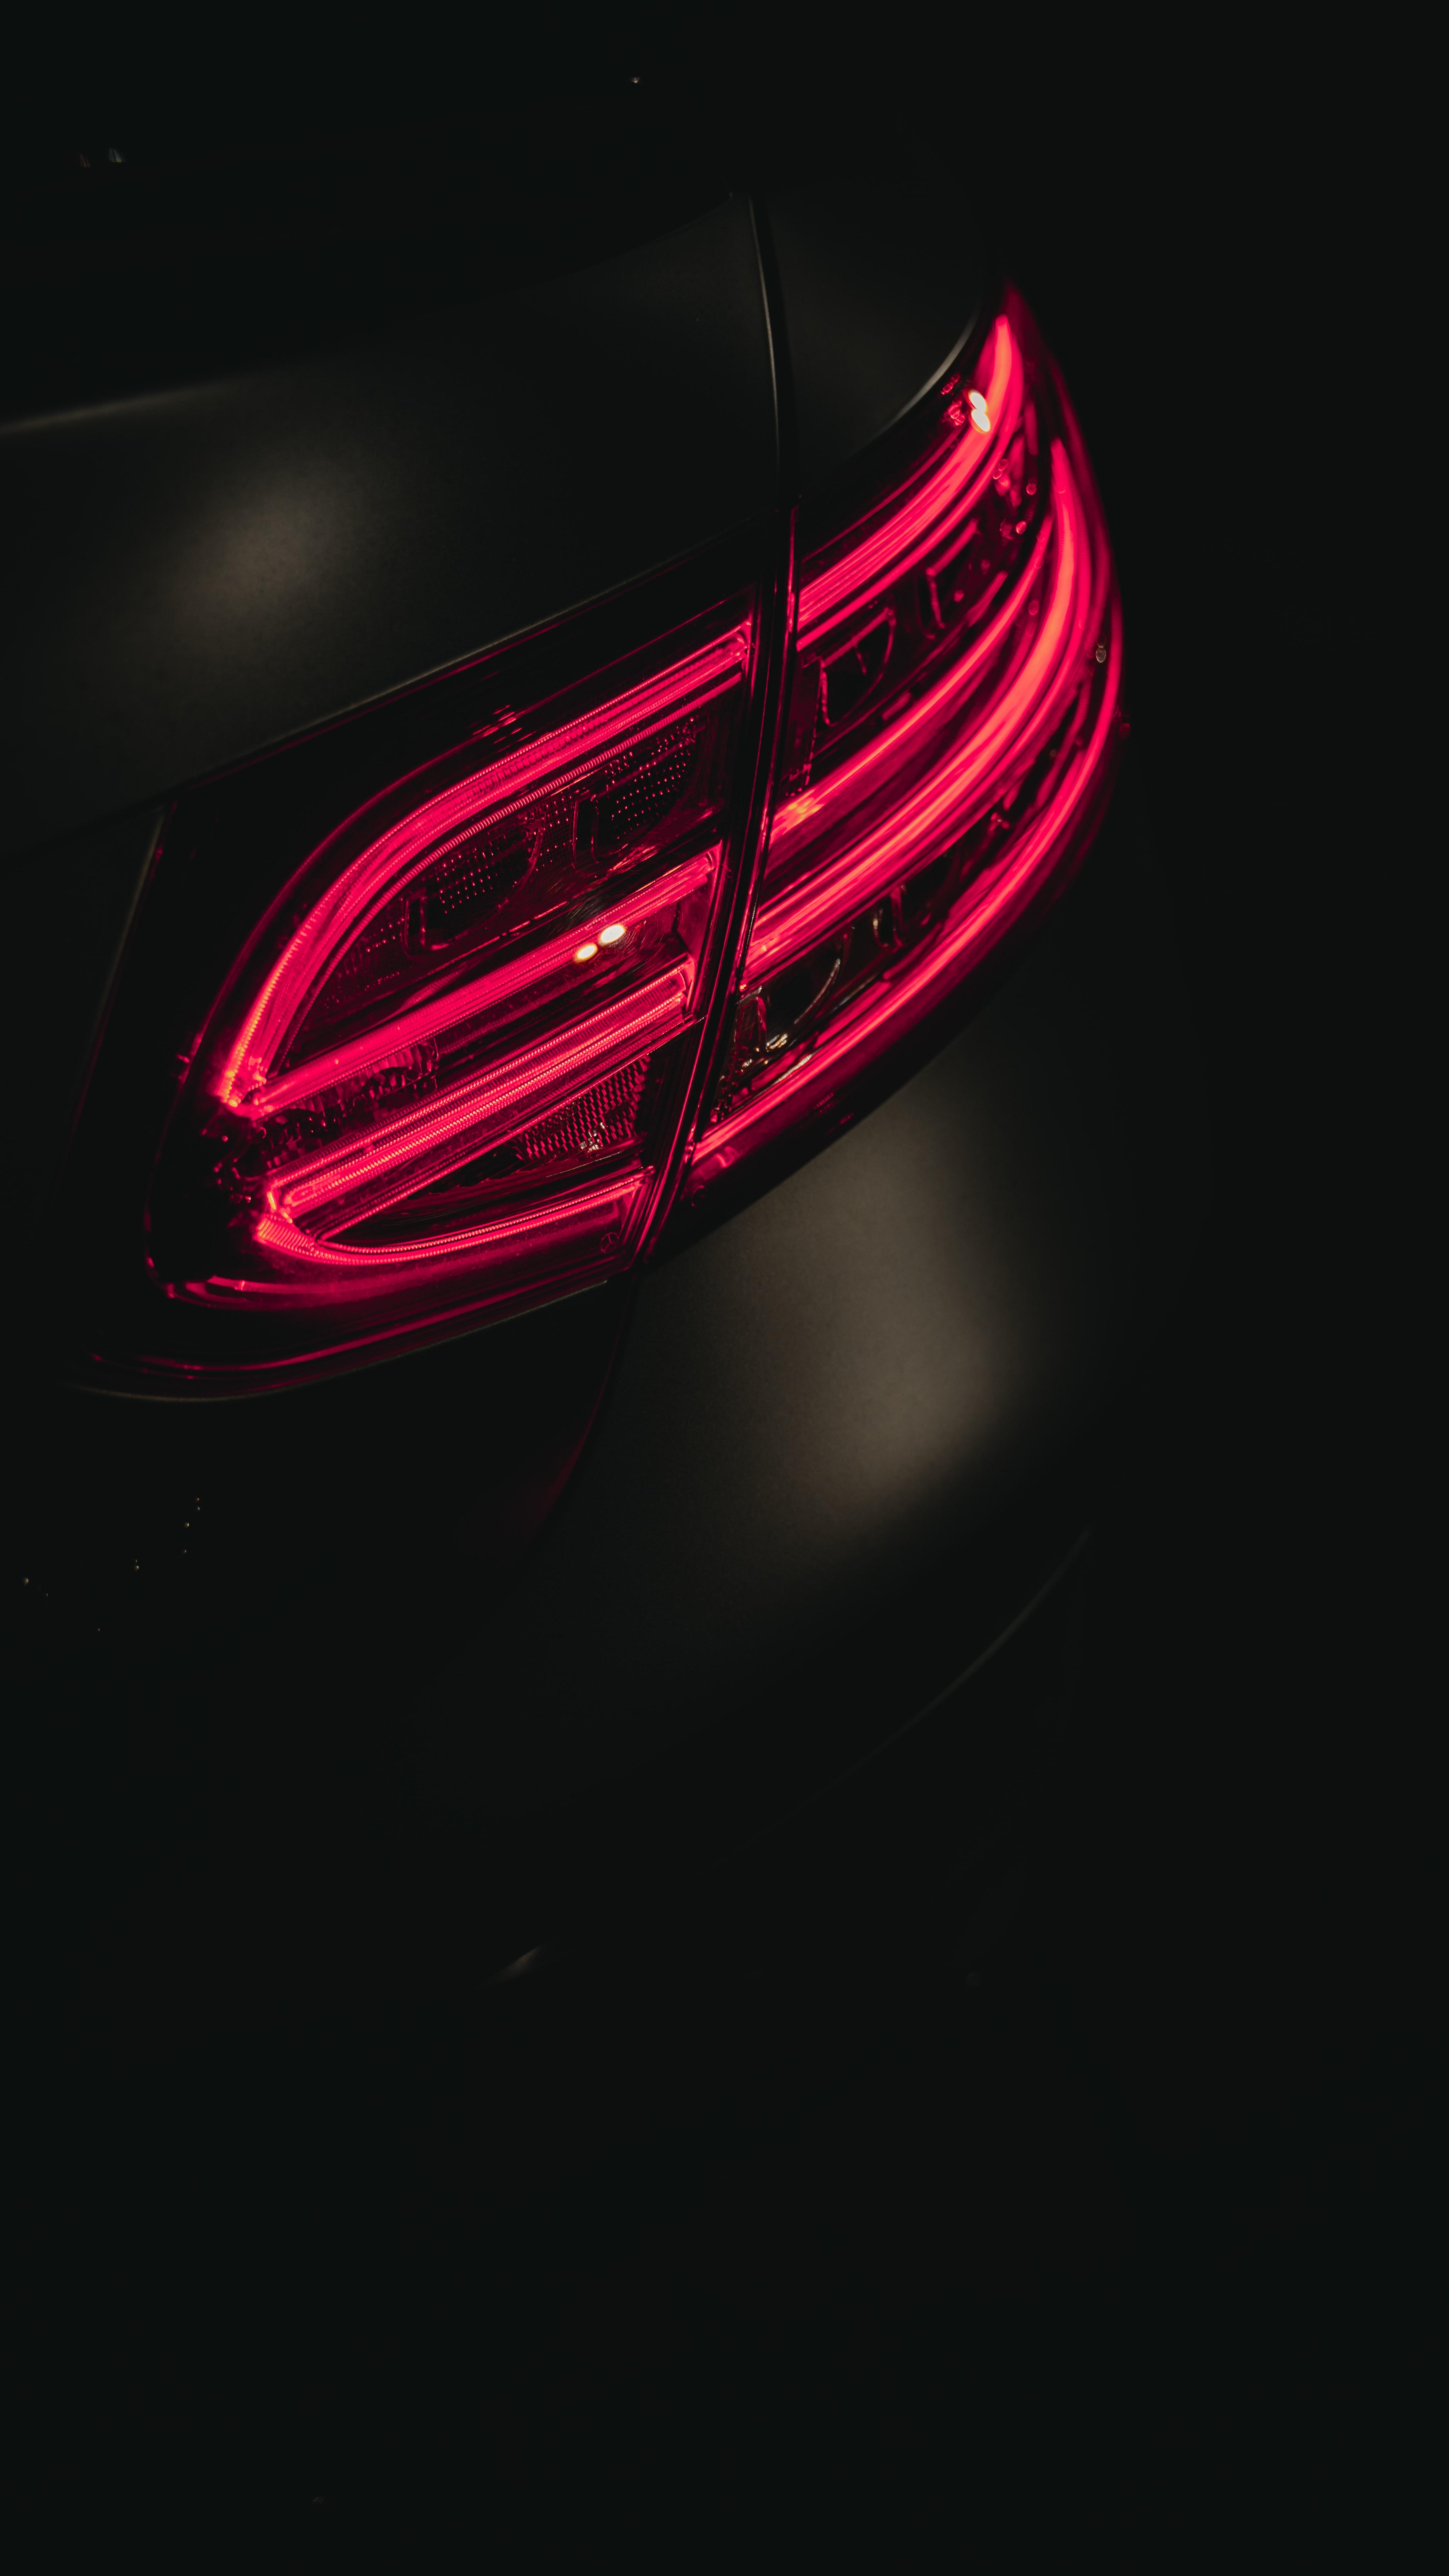 90759 download wallpaper Cars, Lamp, Lantern, Glow, Dark, Car screensavers and pictures for free